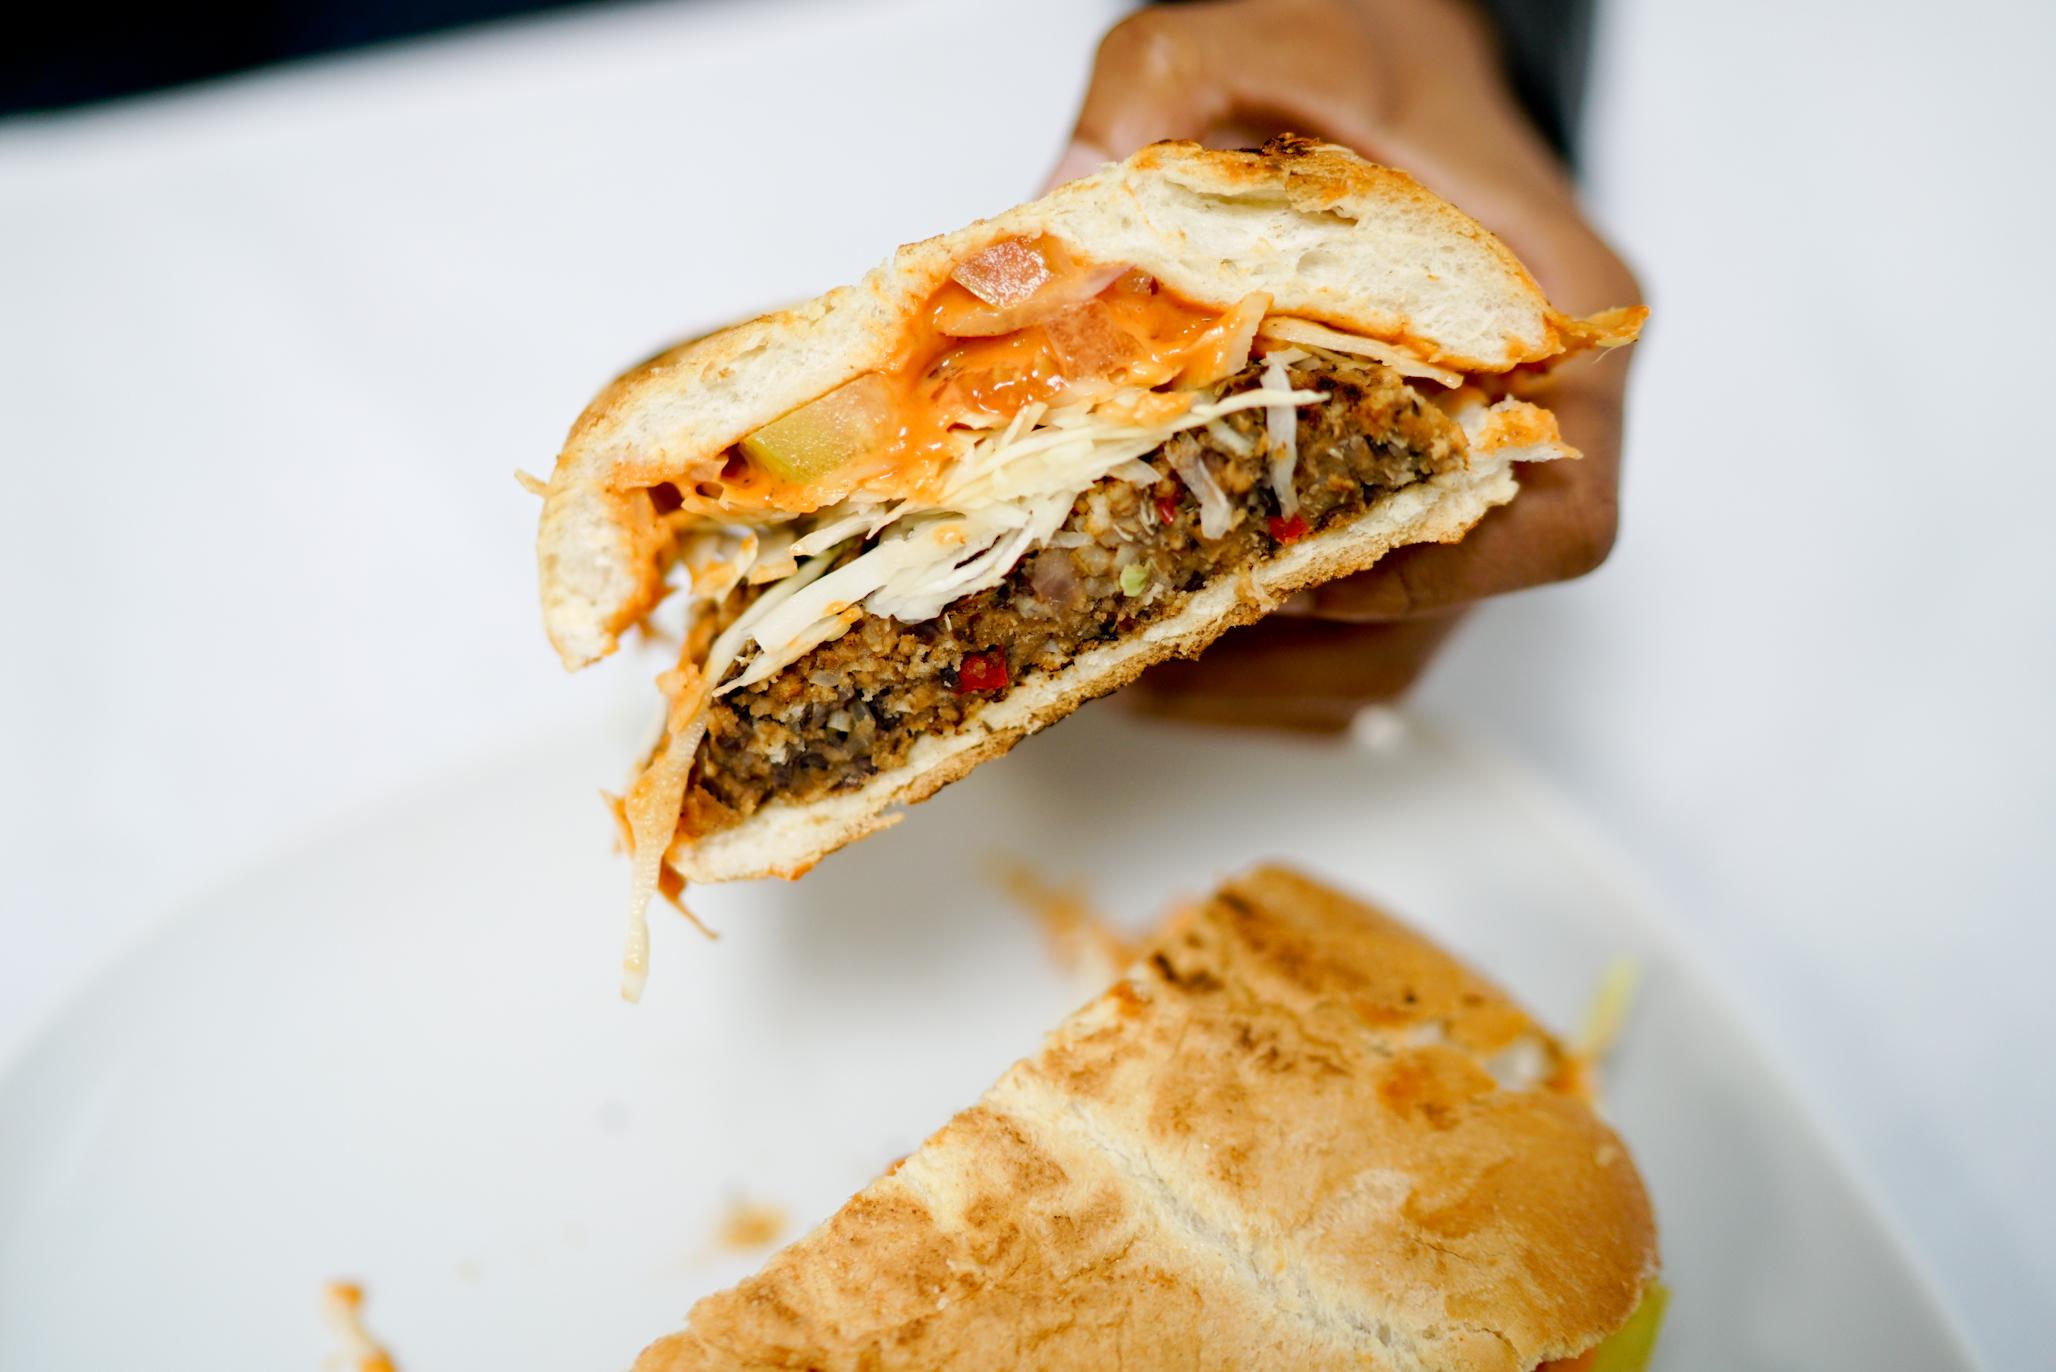 The Vegan Chimi Burger